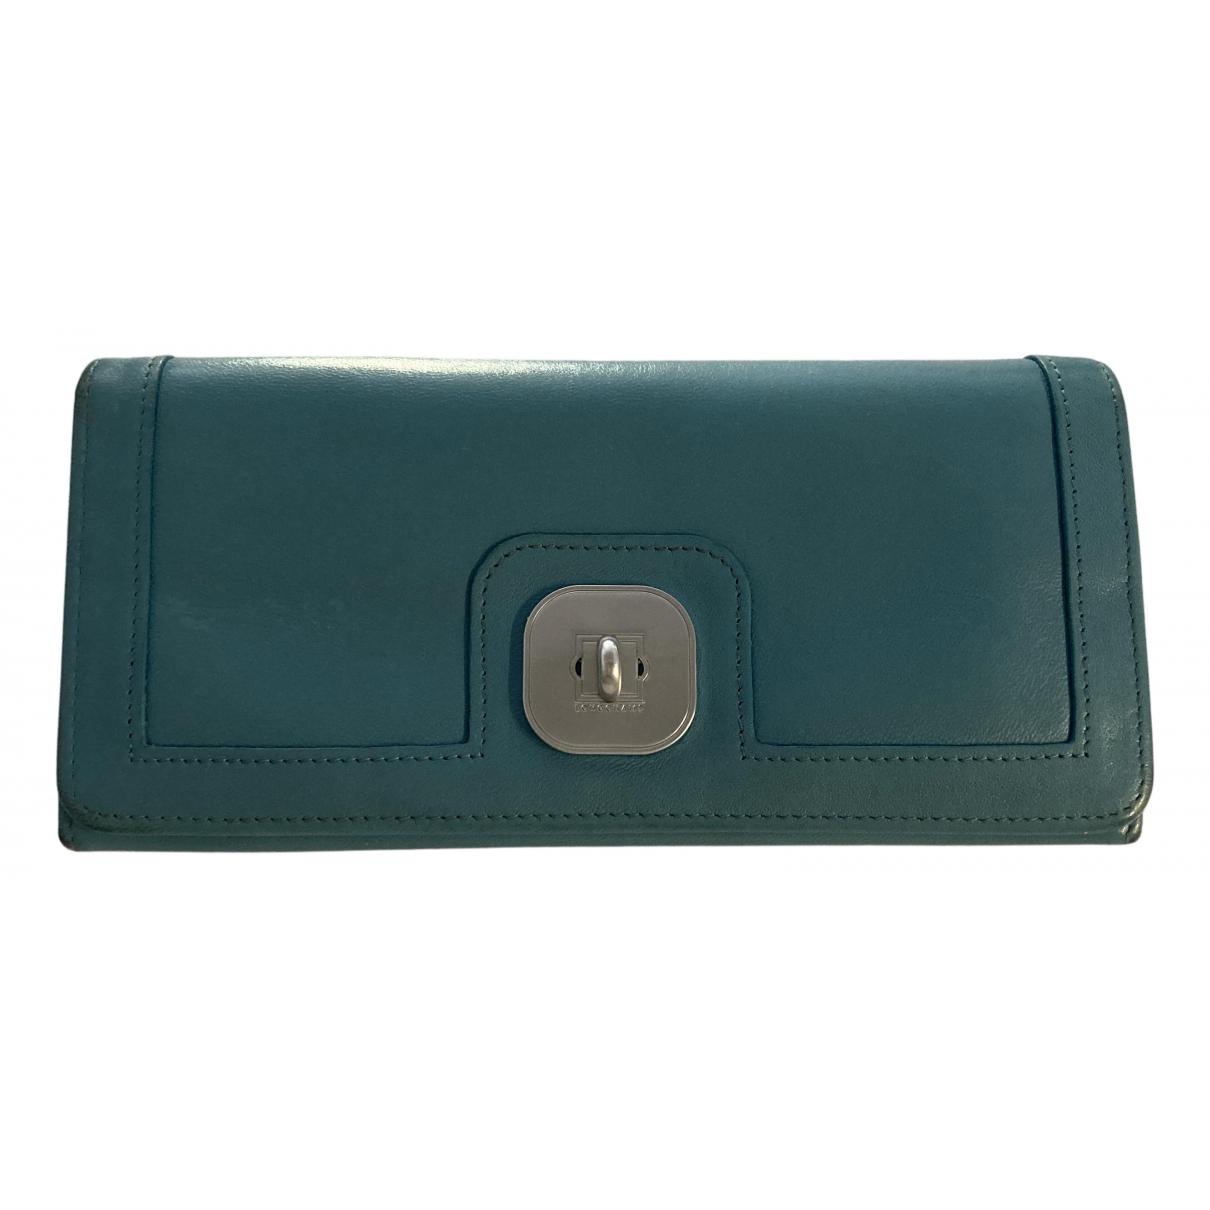 Longchamp \N Portemonnaie in  Blau Leder